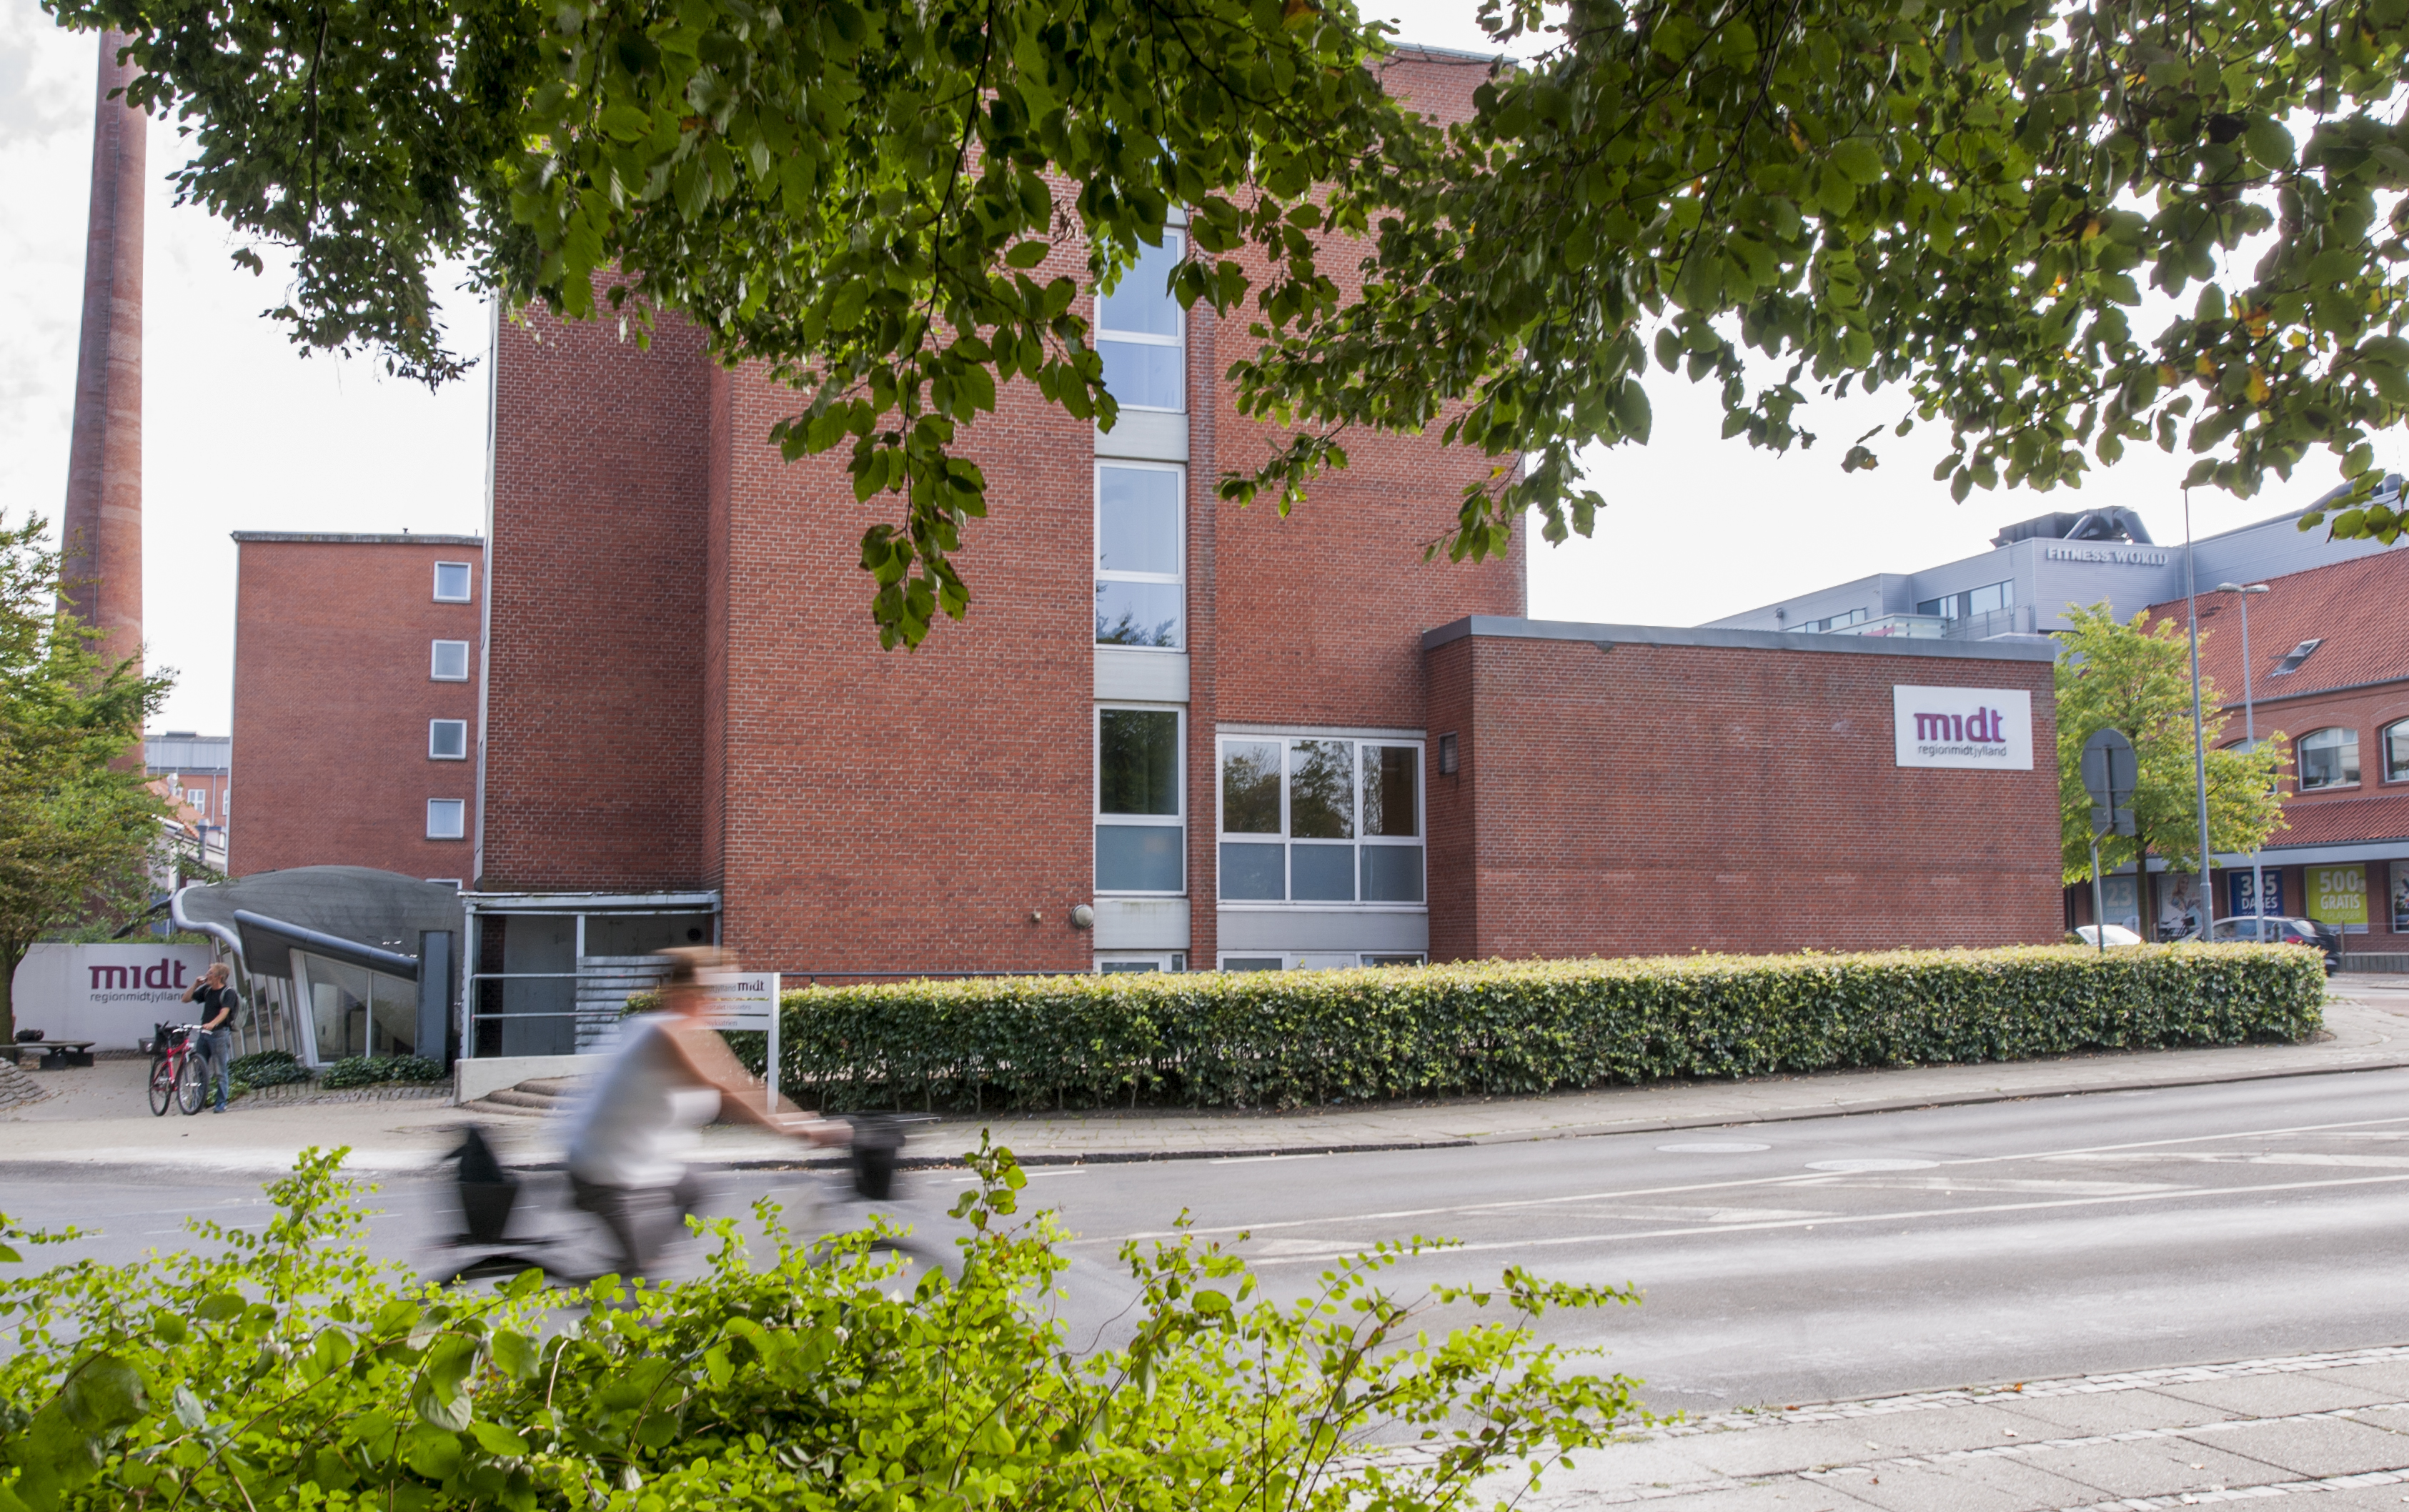 region midtjylland regionshuset viborg